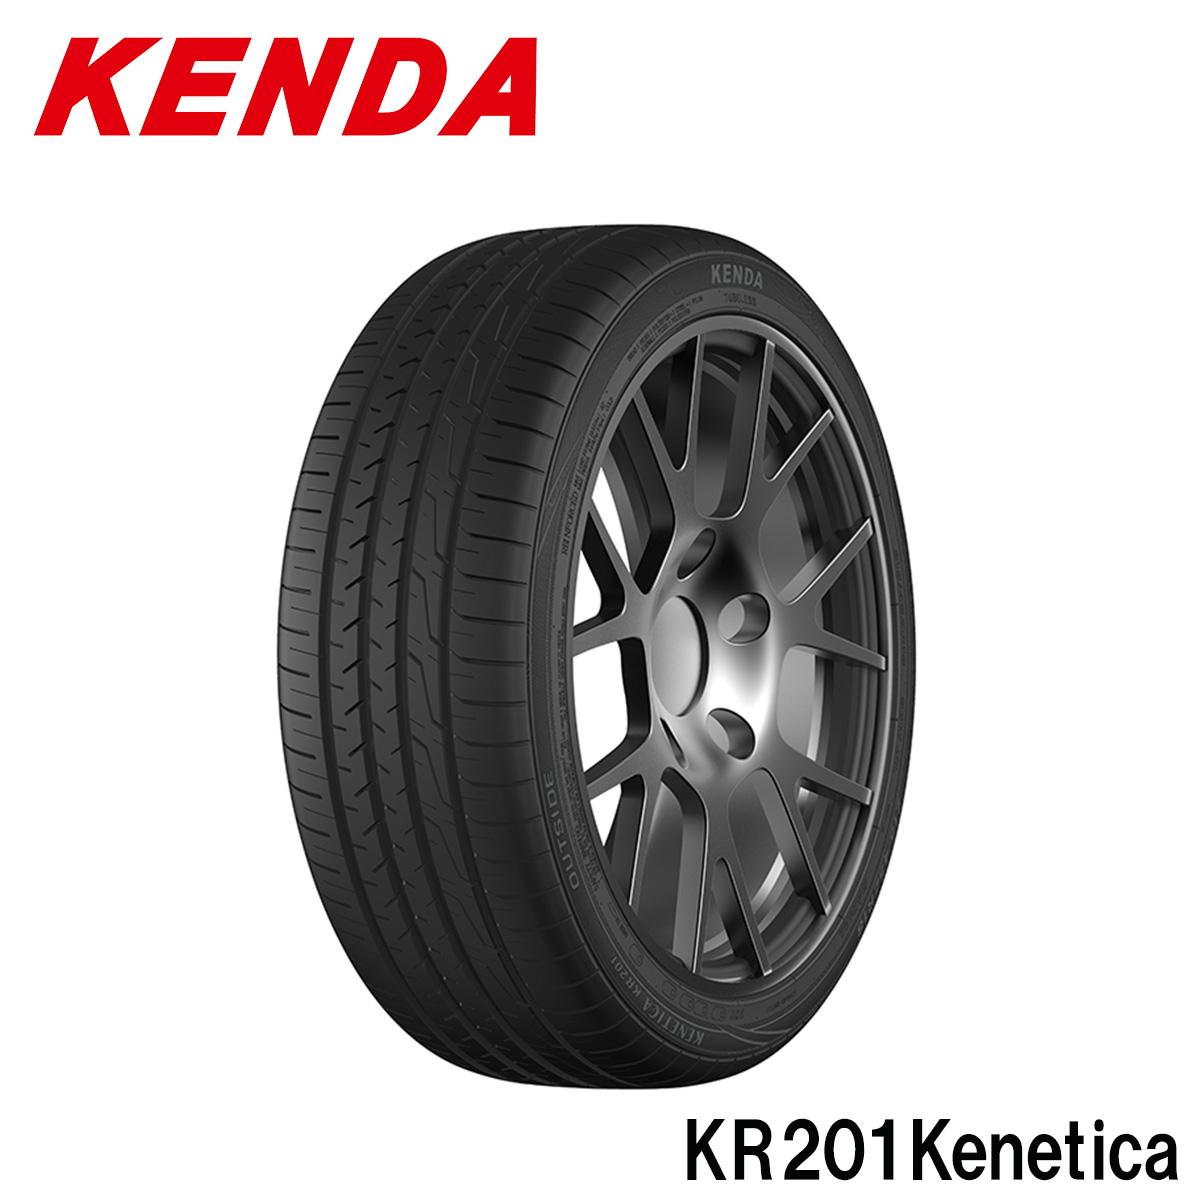 KENDA ケンダ ミニバン タイア 2本 2本 16インチ タイア 205/65R16 205/65R16 KR201 Kenetica, ジェイウェルドットコム:fae62810 --- officewill.xsrv.jp